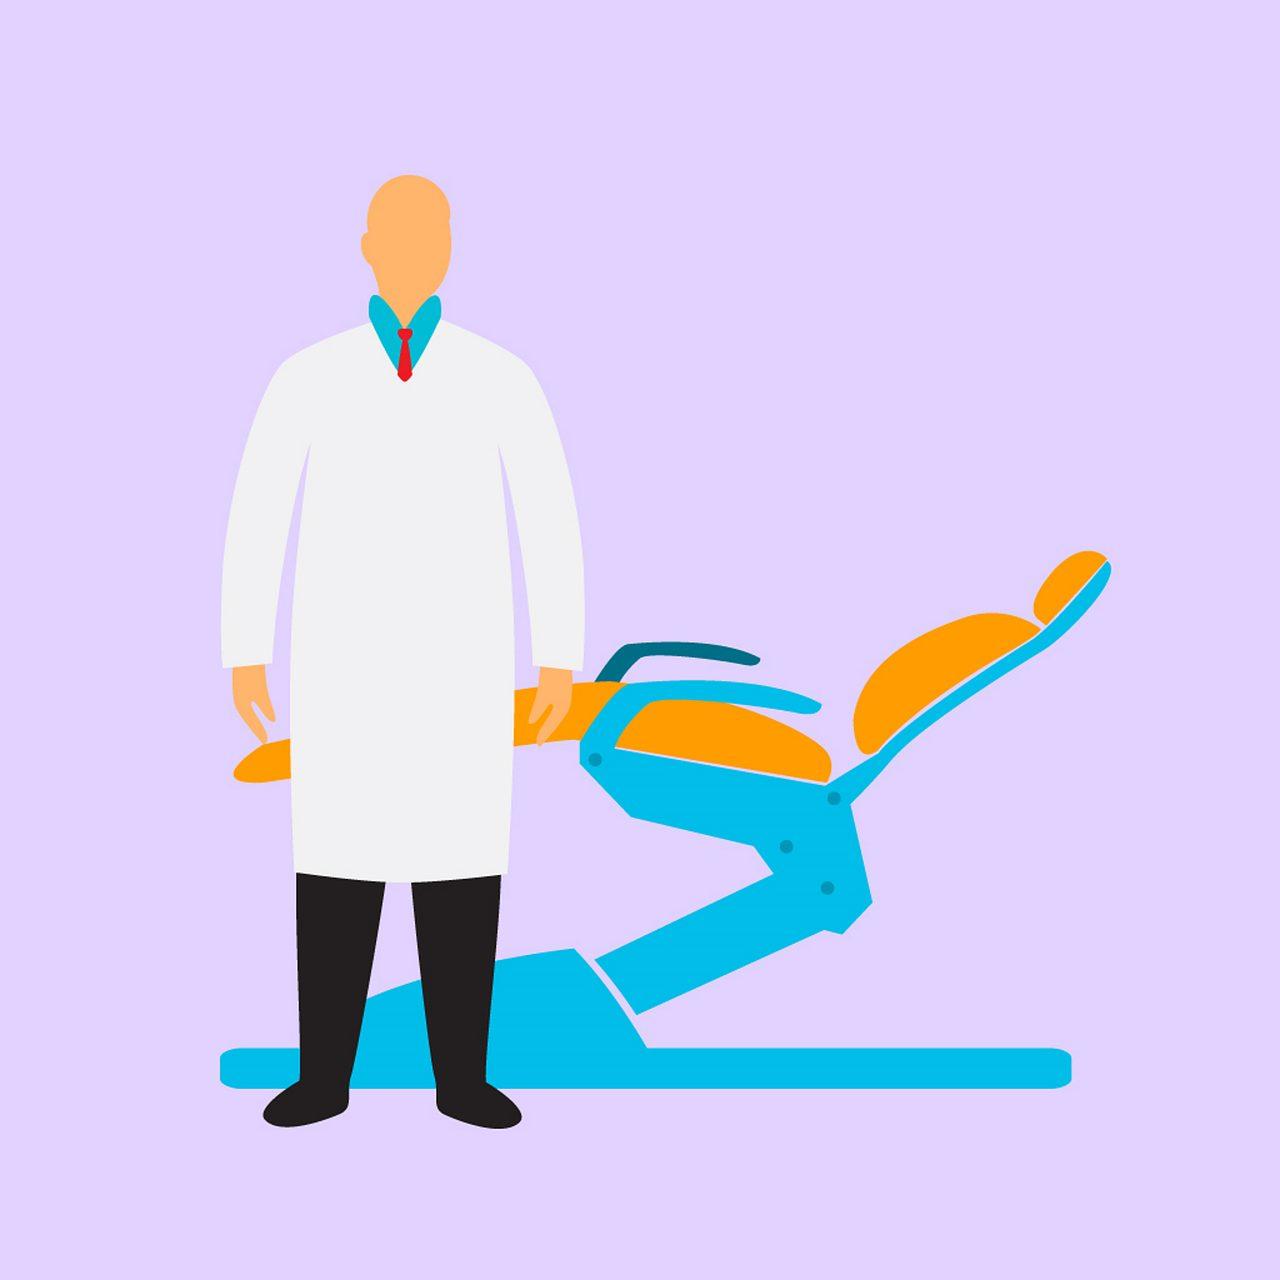 Nautilus Tandartsenpraktijk bang voor tandarts